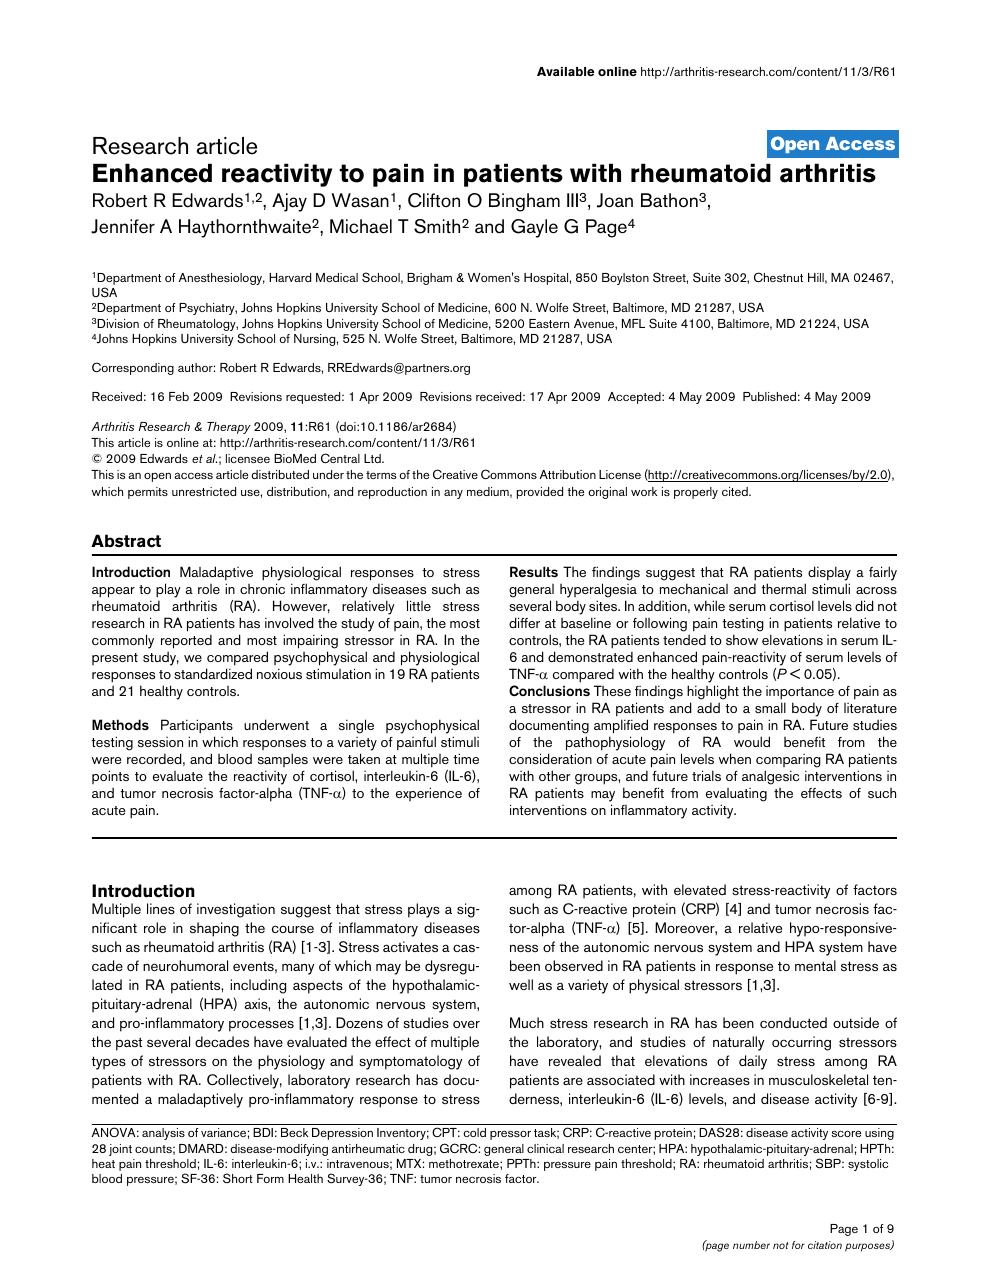 Enhanced reactivity to pain in patients with rheumatoid arthritis